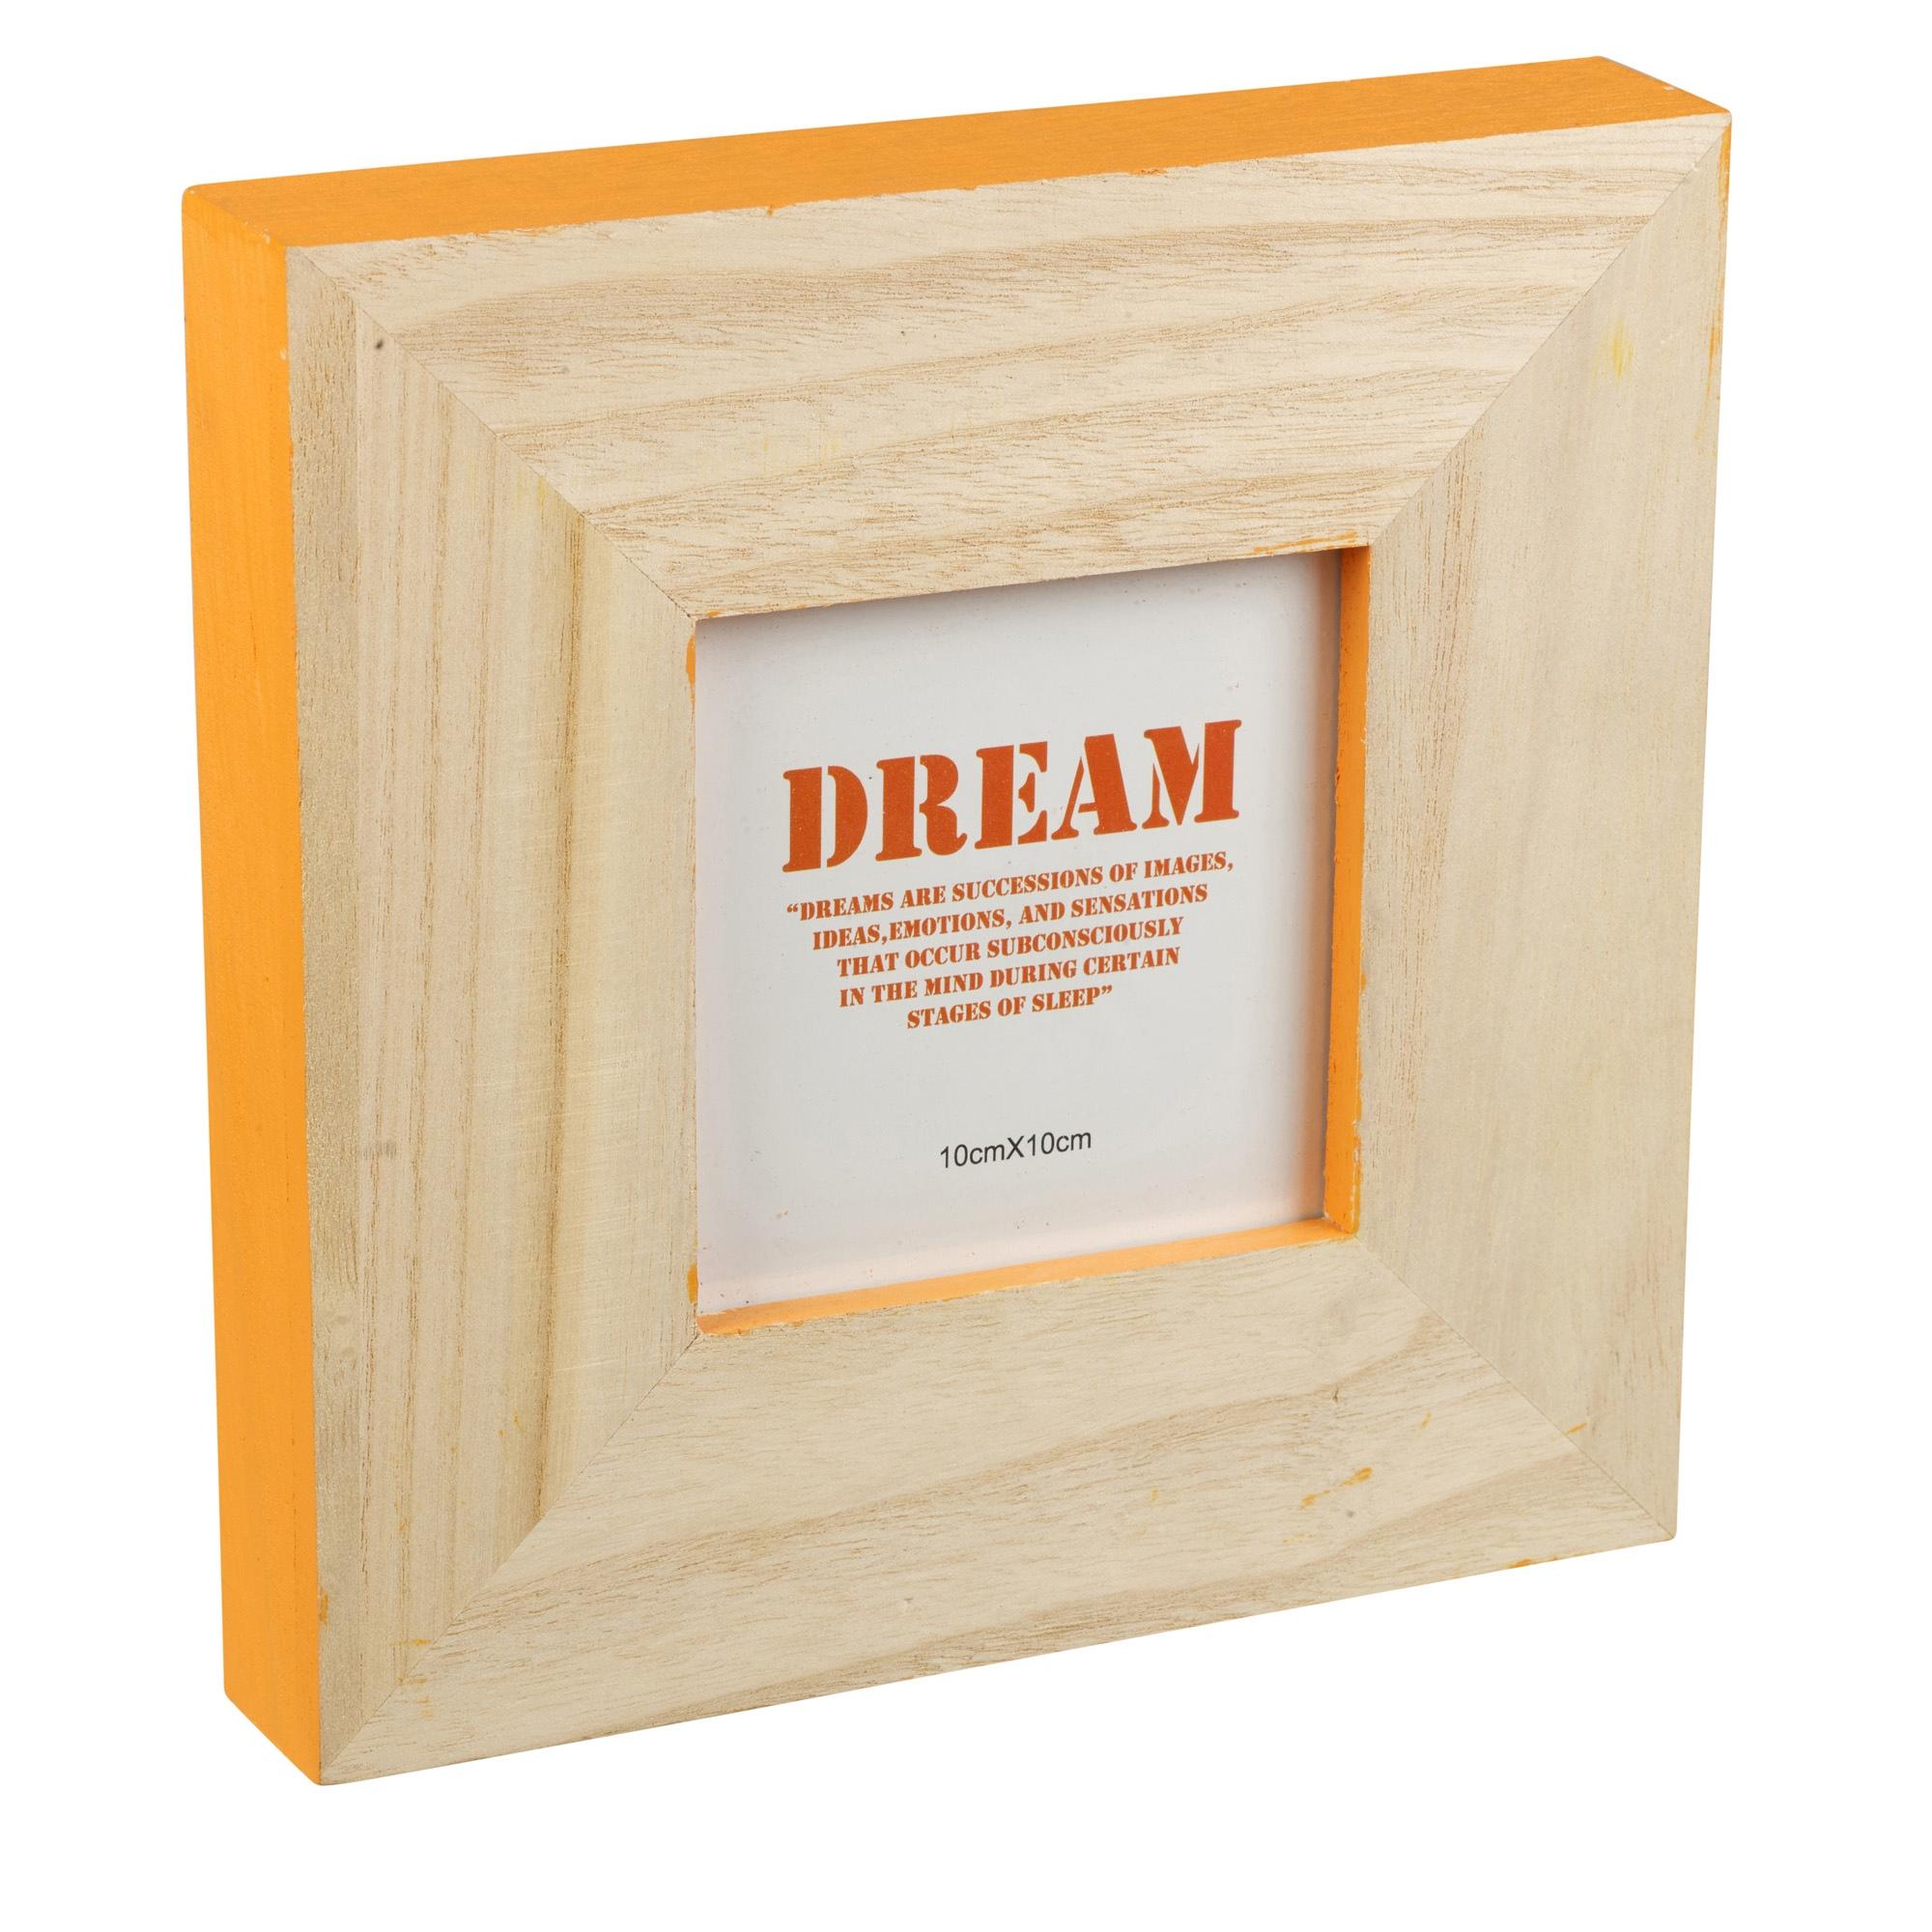 Klobige Einbau 10.2x10.2cm Foto Bilder Rahmen dekorativ Blene ...